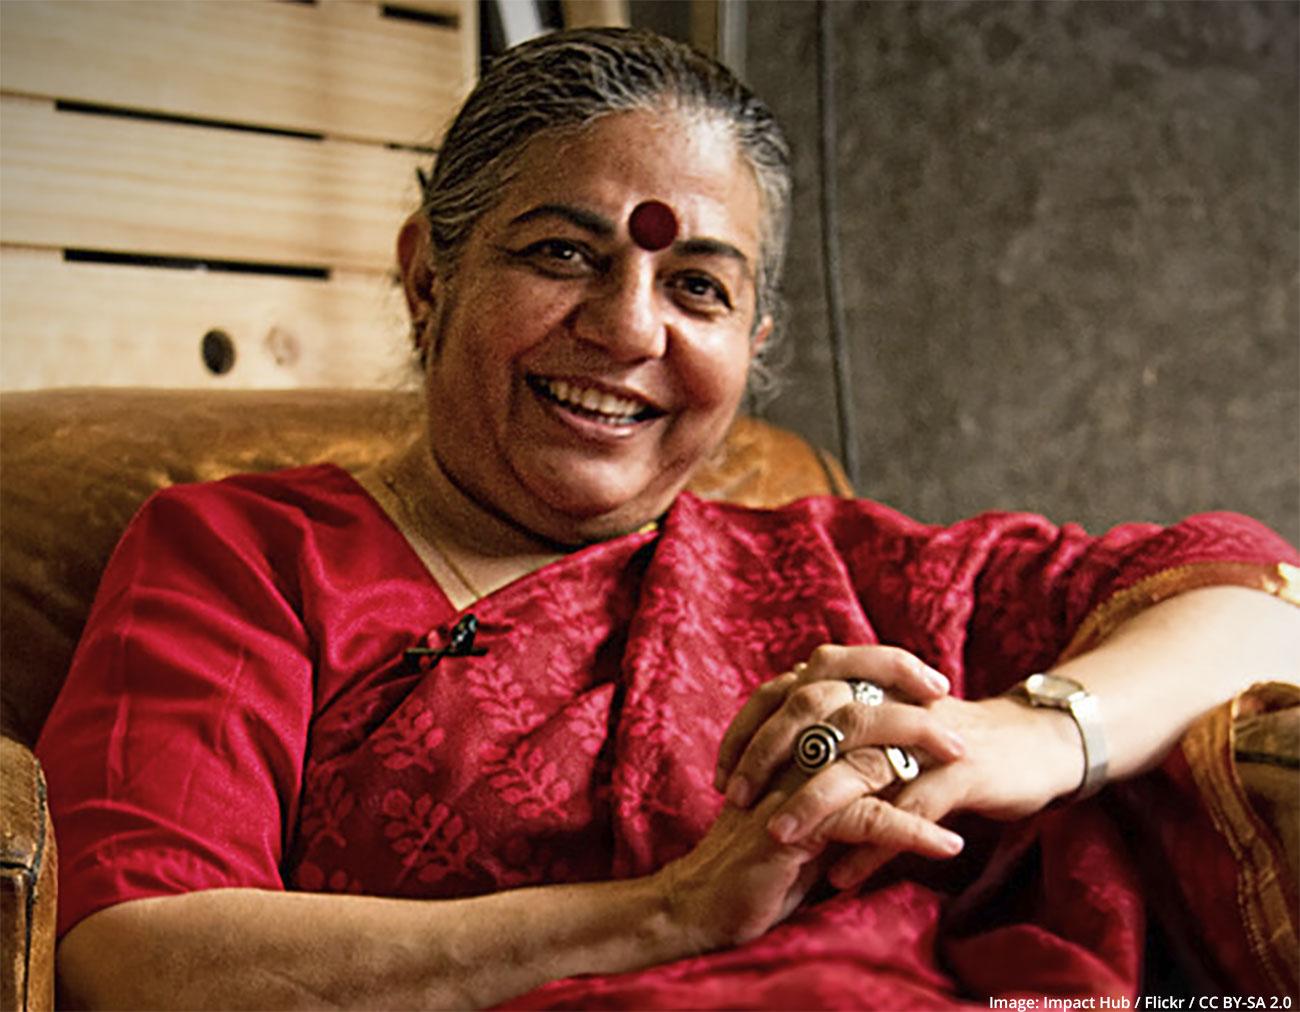 Vandana Shiva fights dependence on patented seeds, Monsanto & Co.